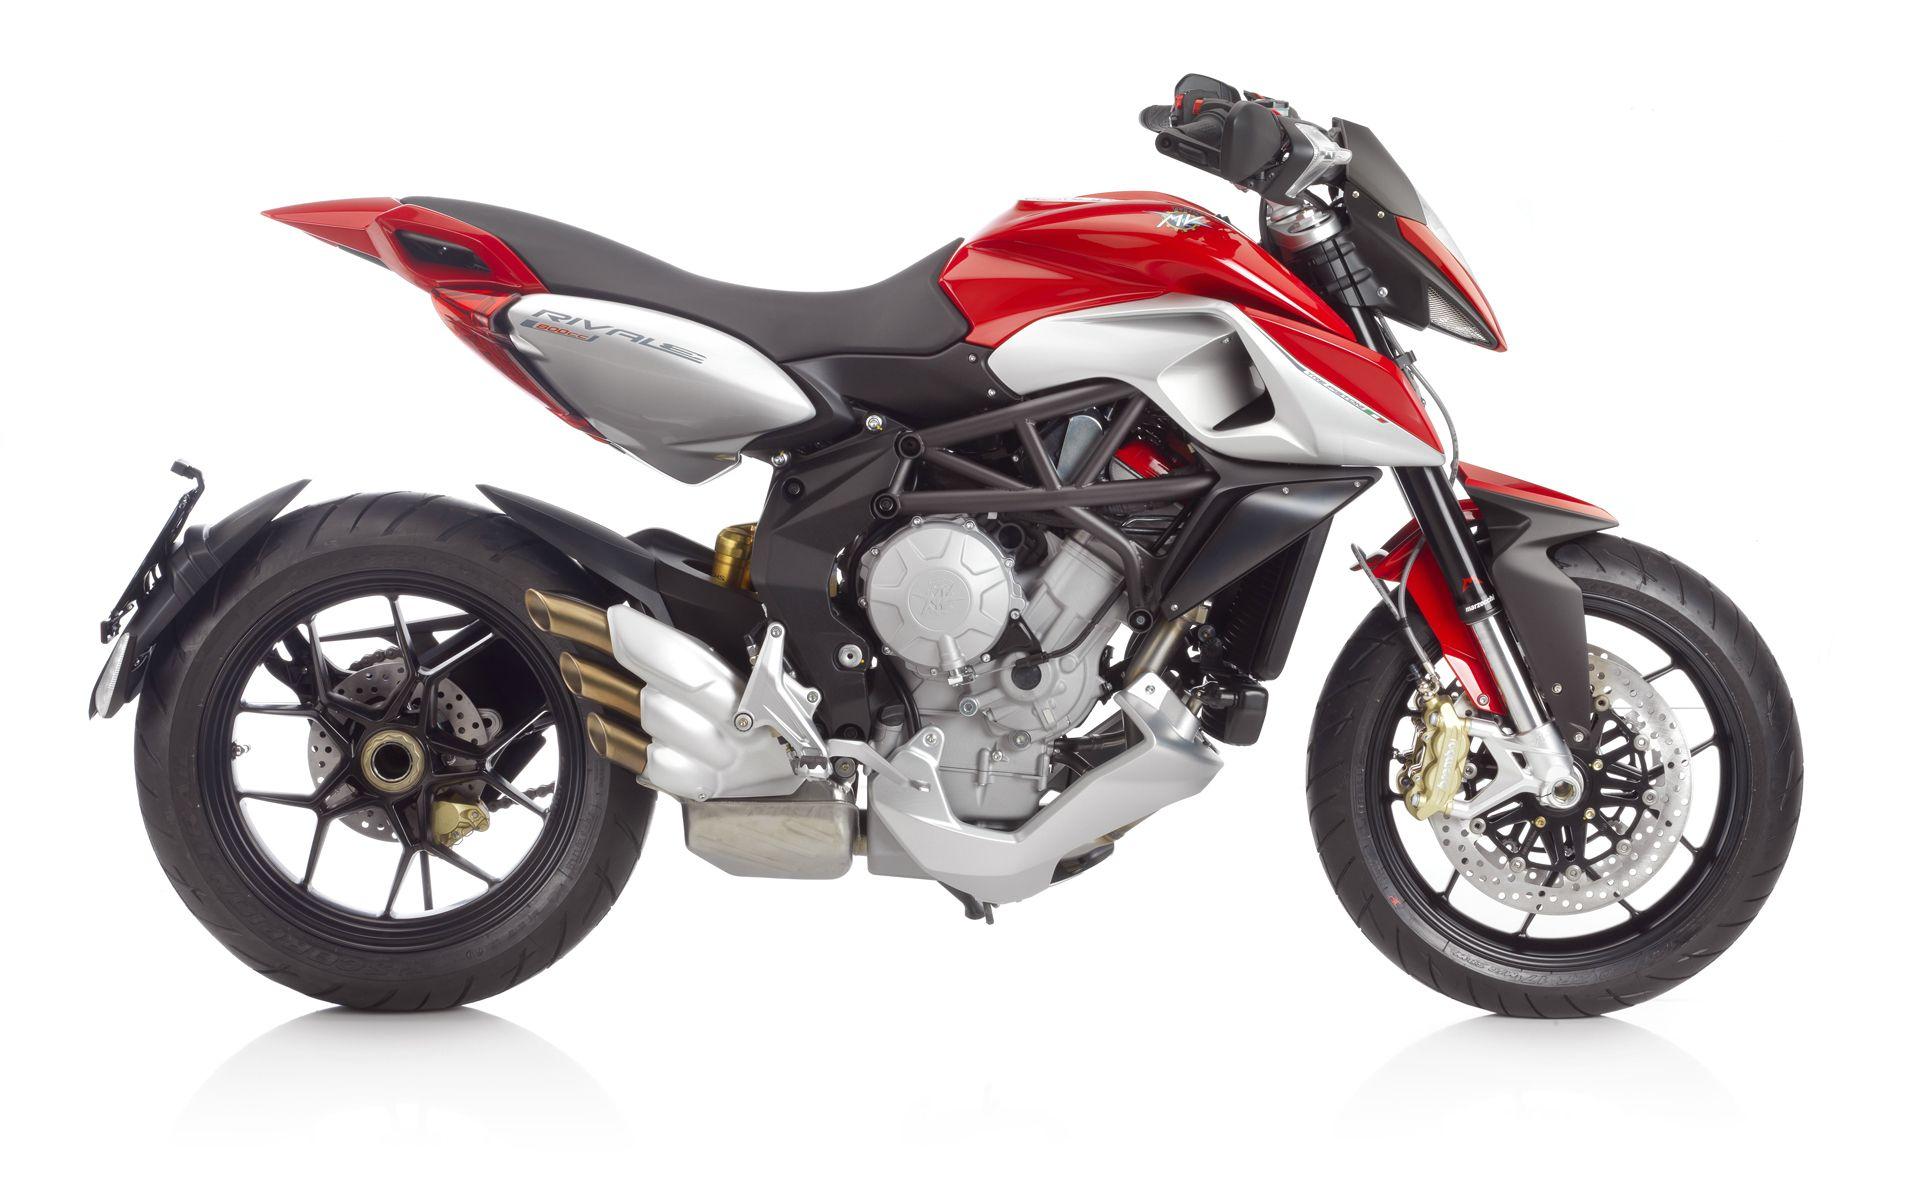 MV Agusta Rivale Motorcycle Rim Wheel Decal Accessory Sticker